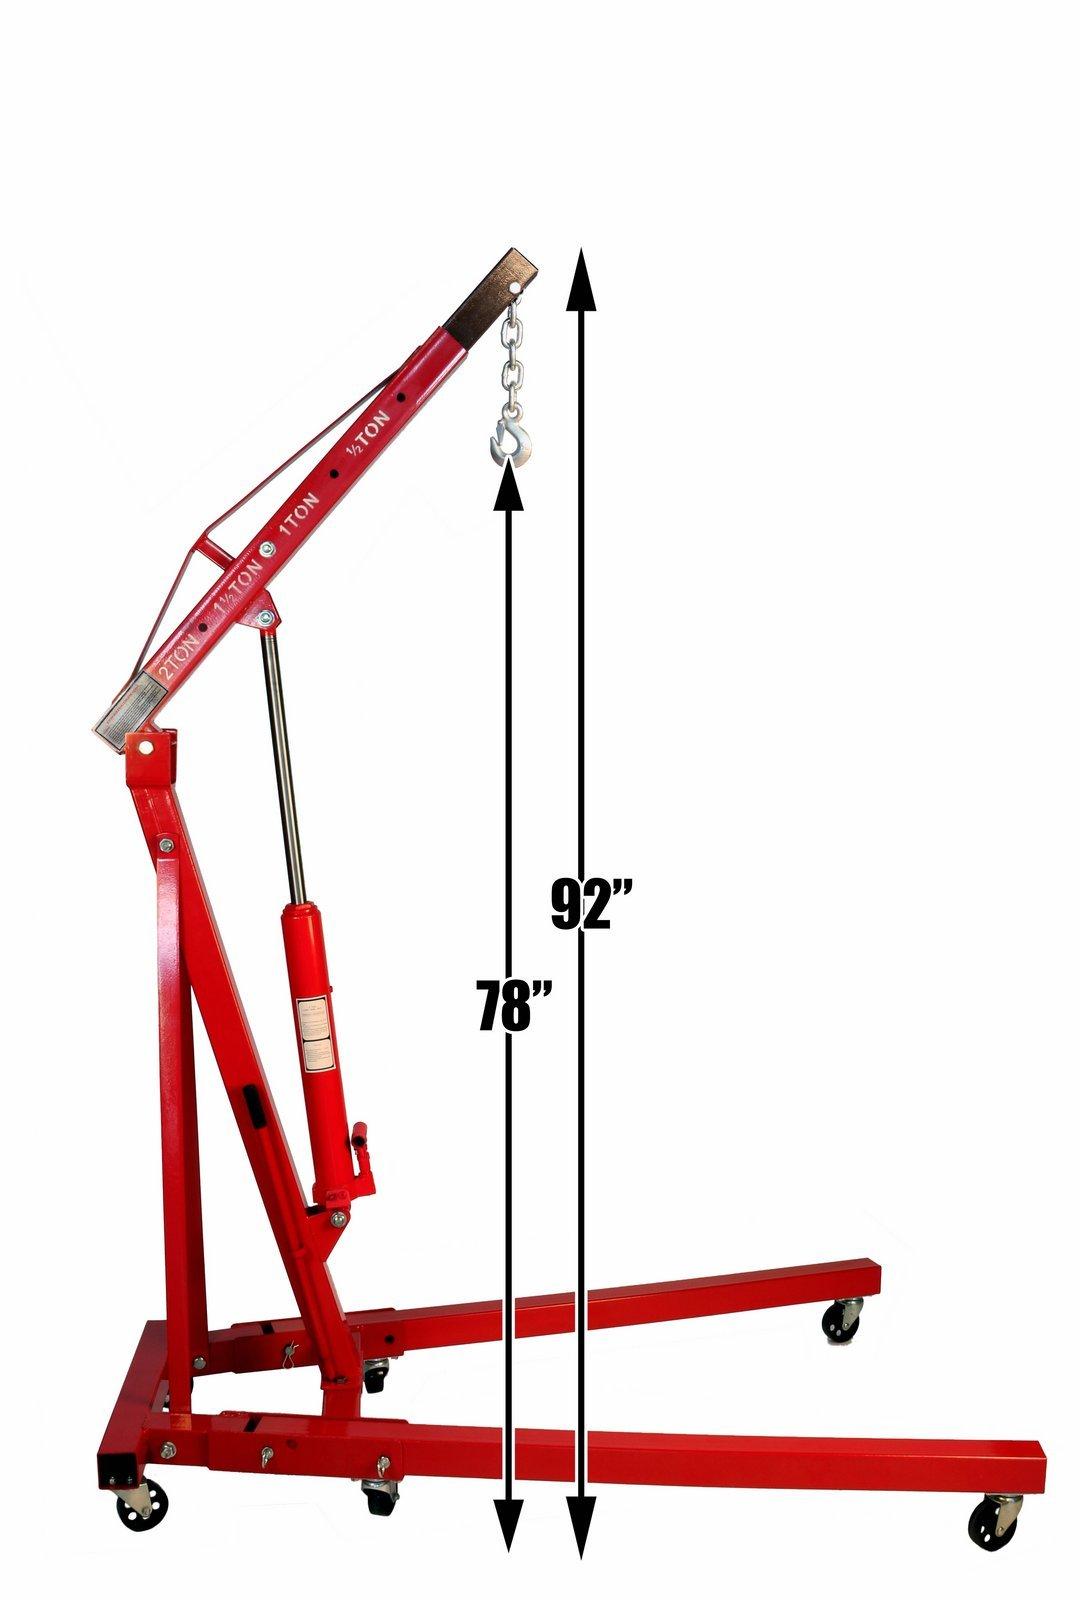 Dragway Tools 2 Ton Folding Hydraulic Engine Hoist Cherry Picker Shop Crane Hoist Lift by Dragway Tools (Image #8)